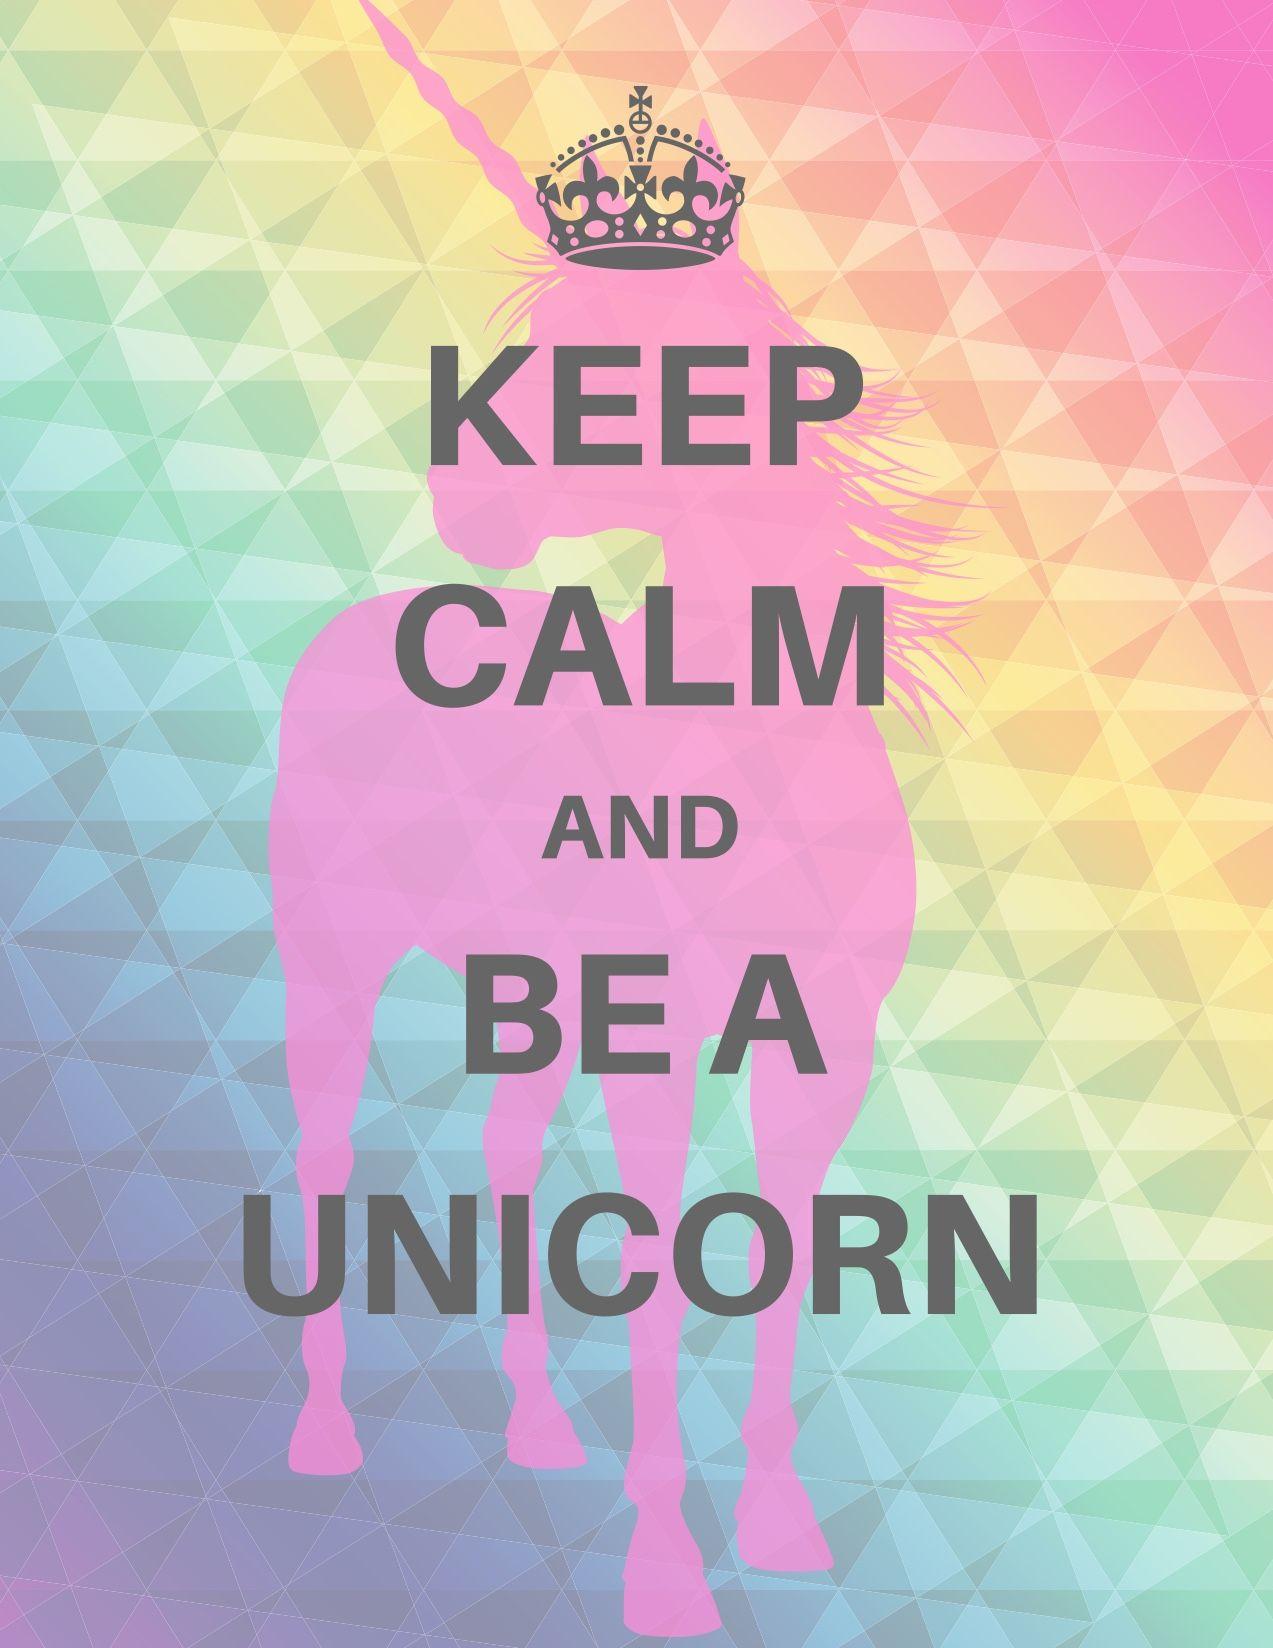 Keep calm and be a unicorn Unicorn Wallpaper Cute, Wallpaper Iphone Cute, Unicorns Wallpaper